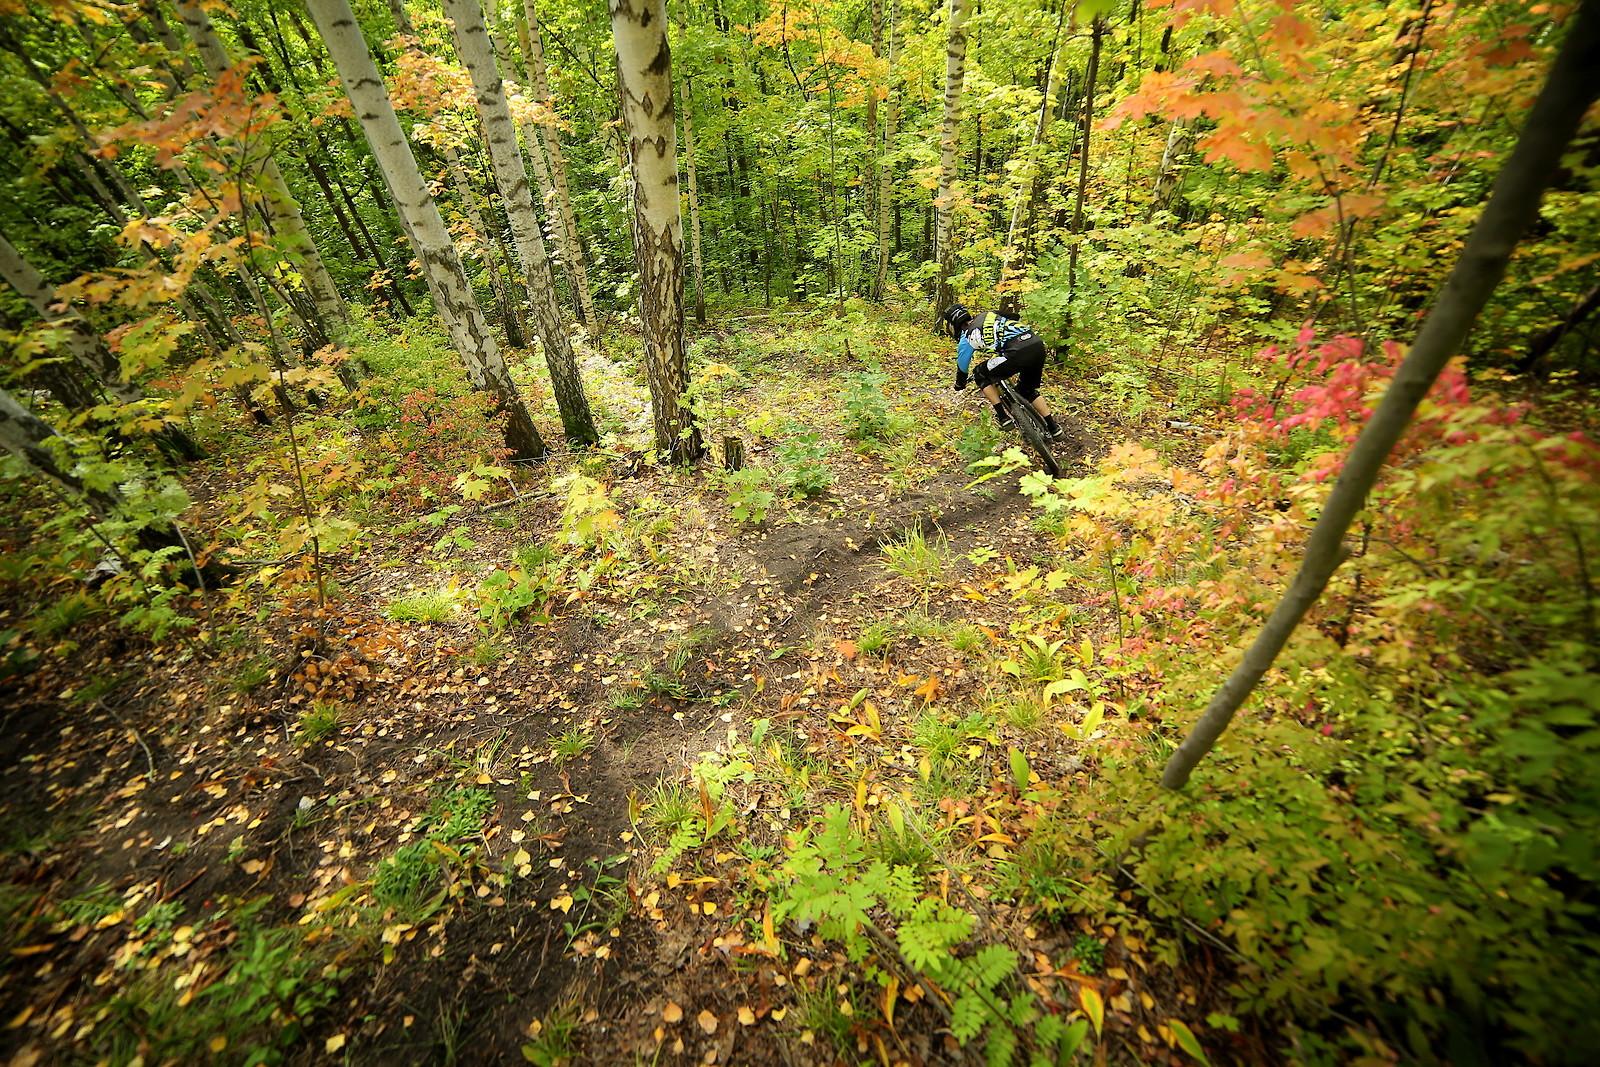 colors of fall - YakuT - Mountain Biking Pictures - Vital MTB